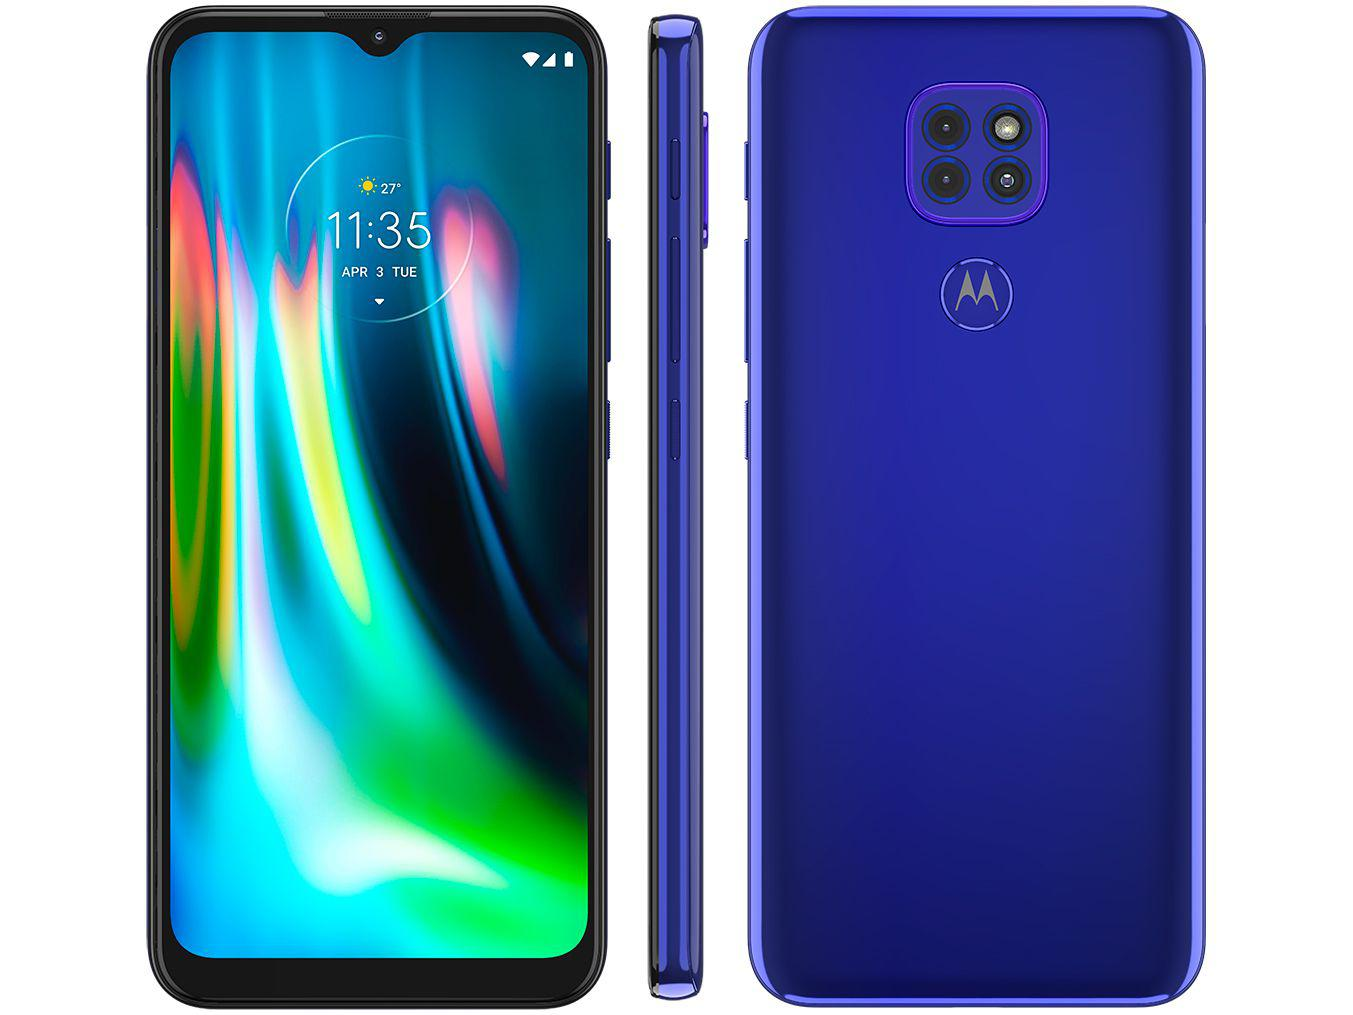 Smartphone Moto G9 Play - Motorola - Azul